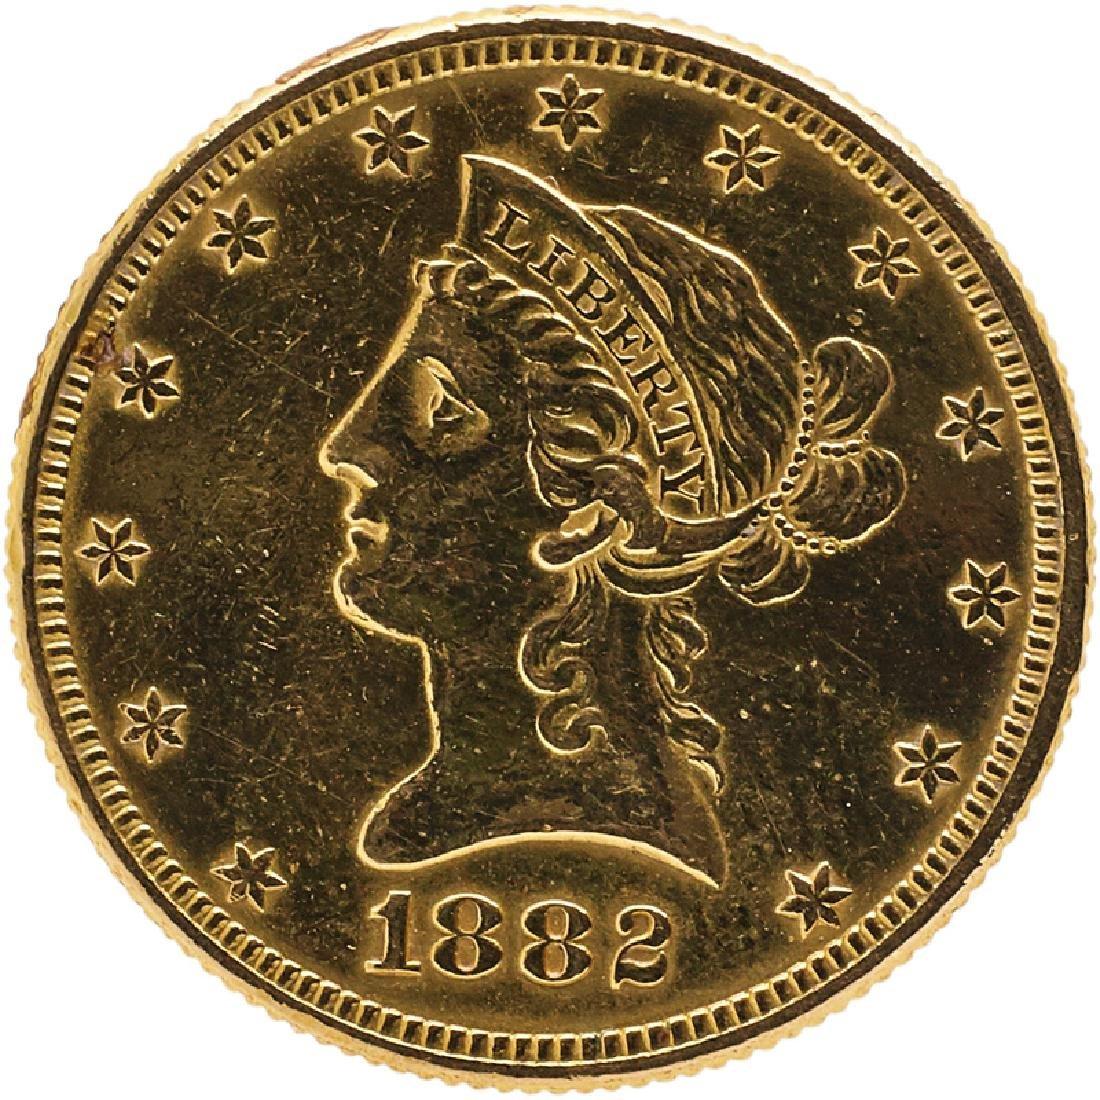 U.S. 1882 LIBERTY $10 GOLD COIN